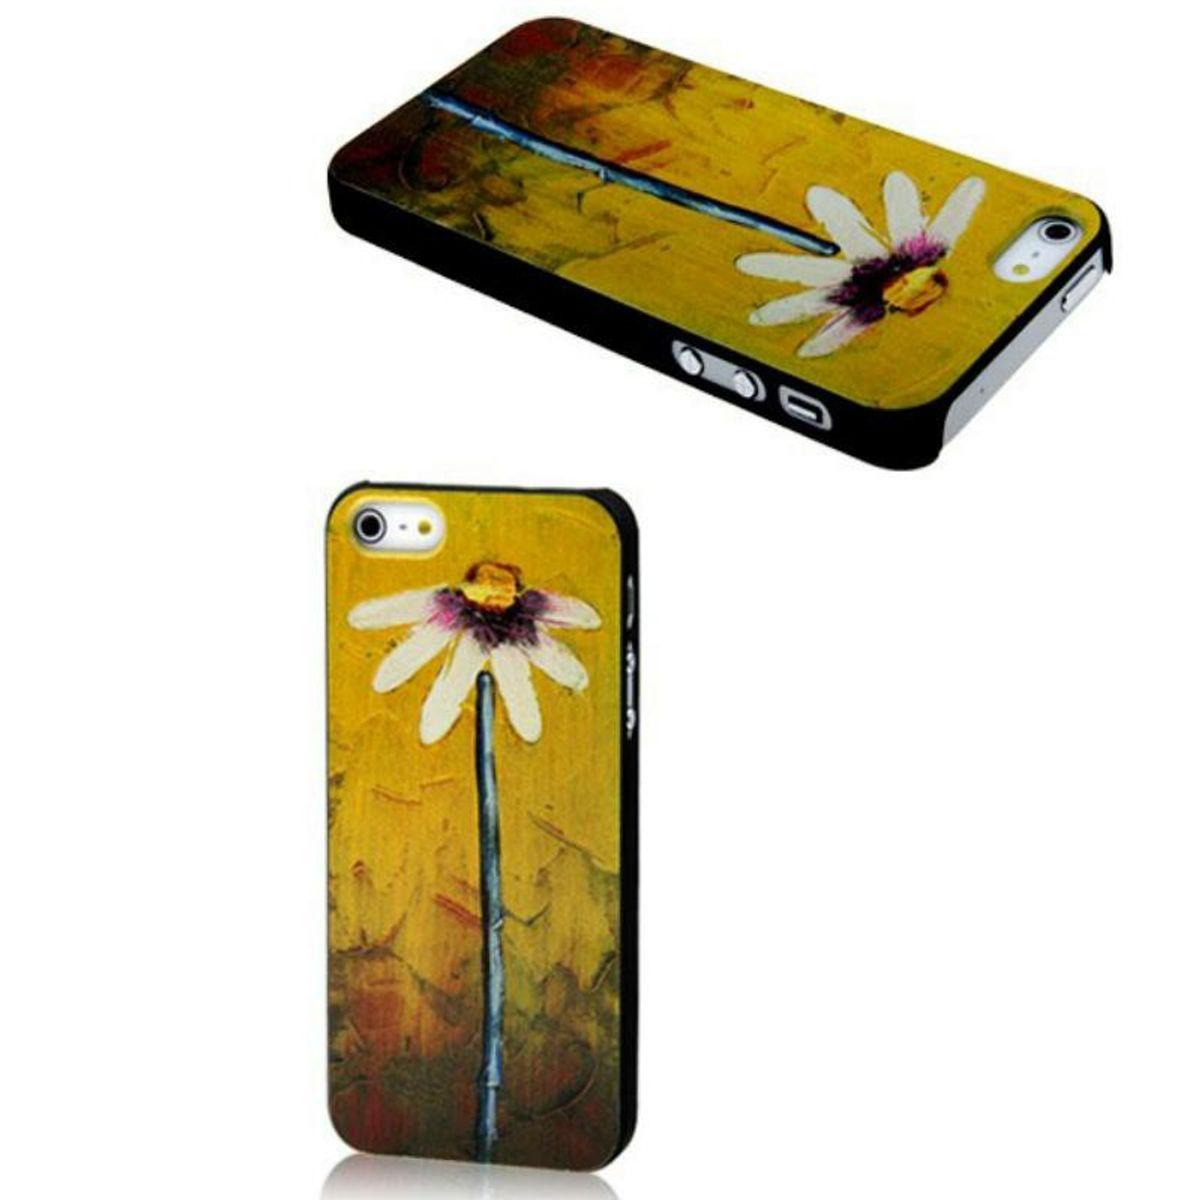 Schutzhülle Case Backcover Hülle Apple iPhone 5 / 5s Blume